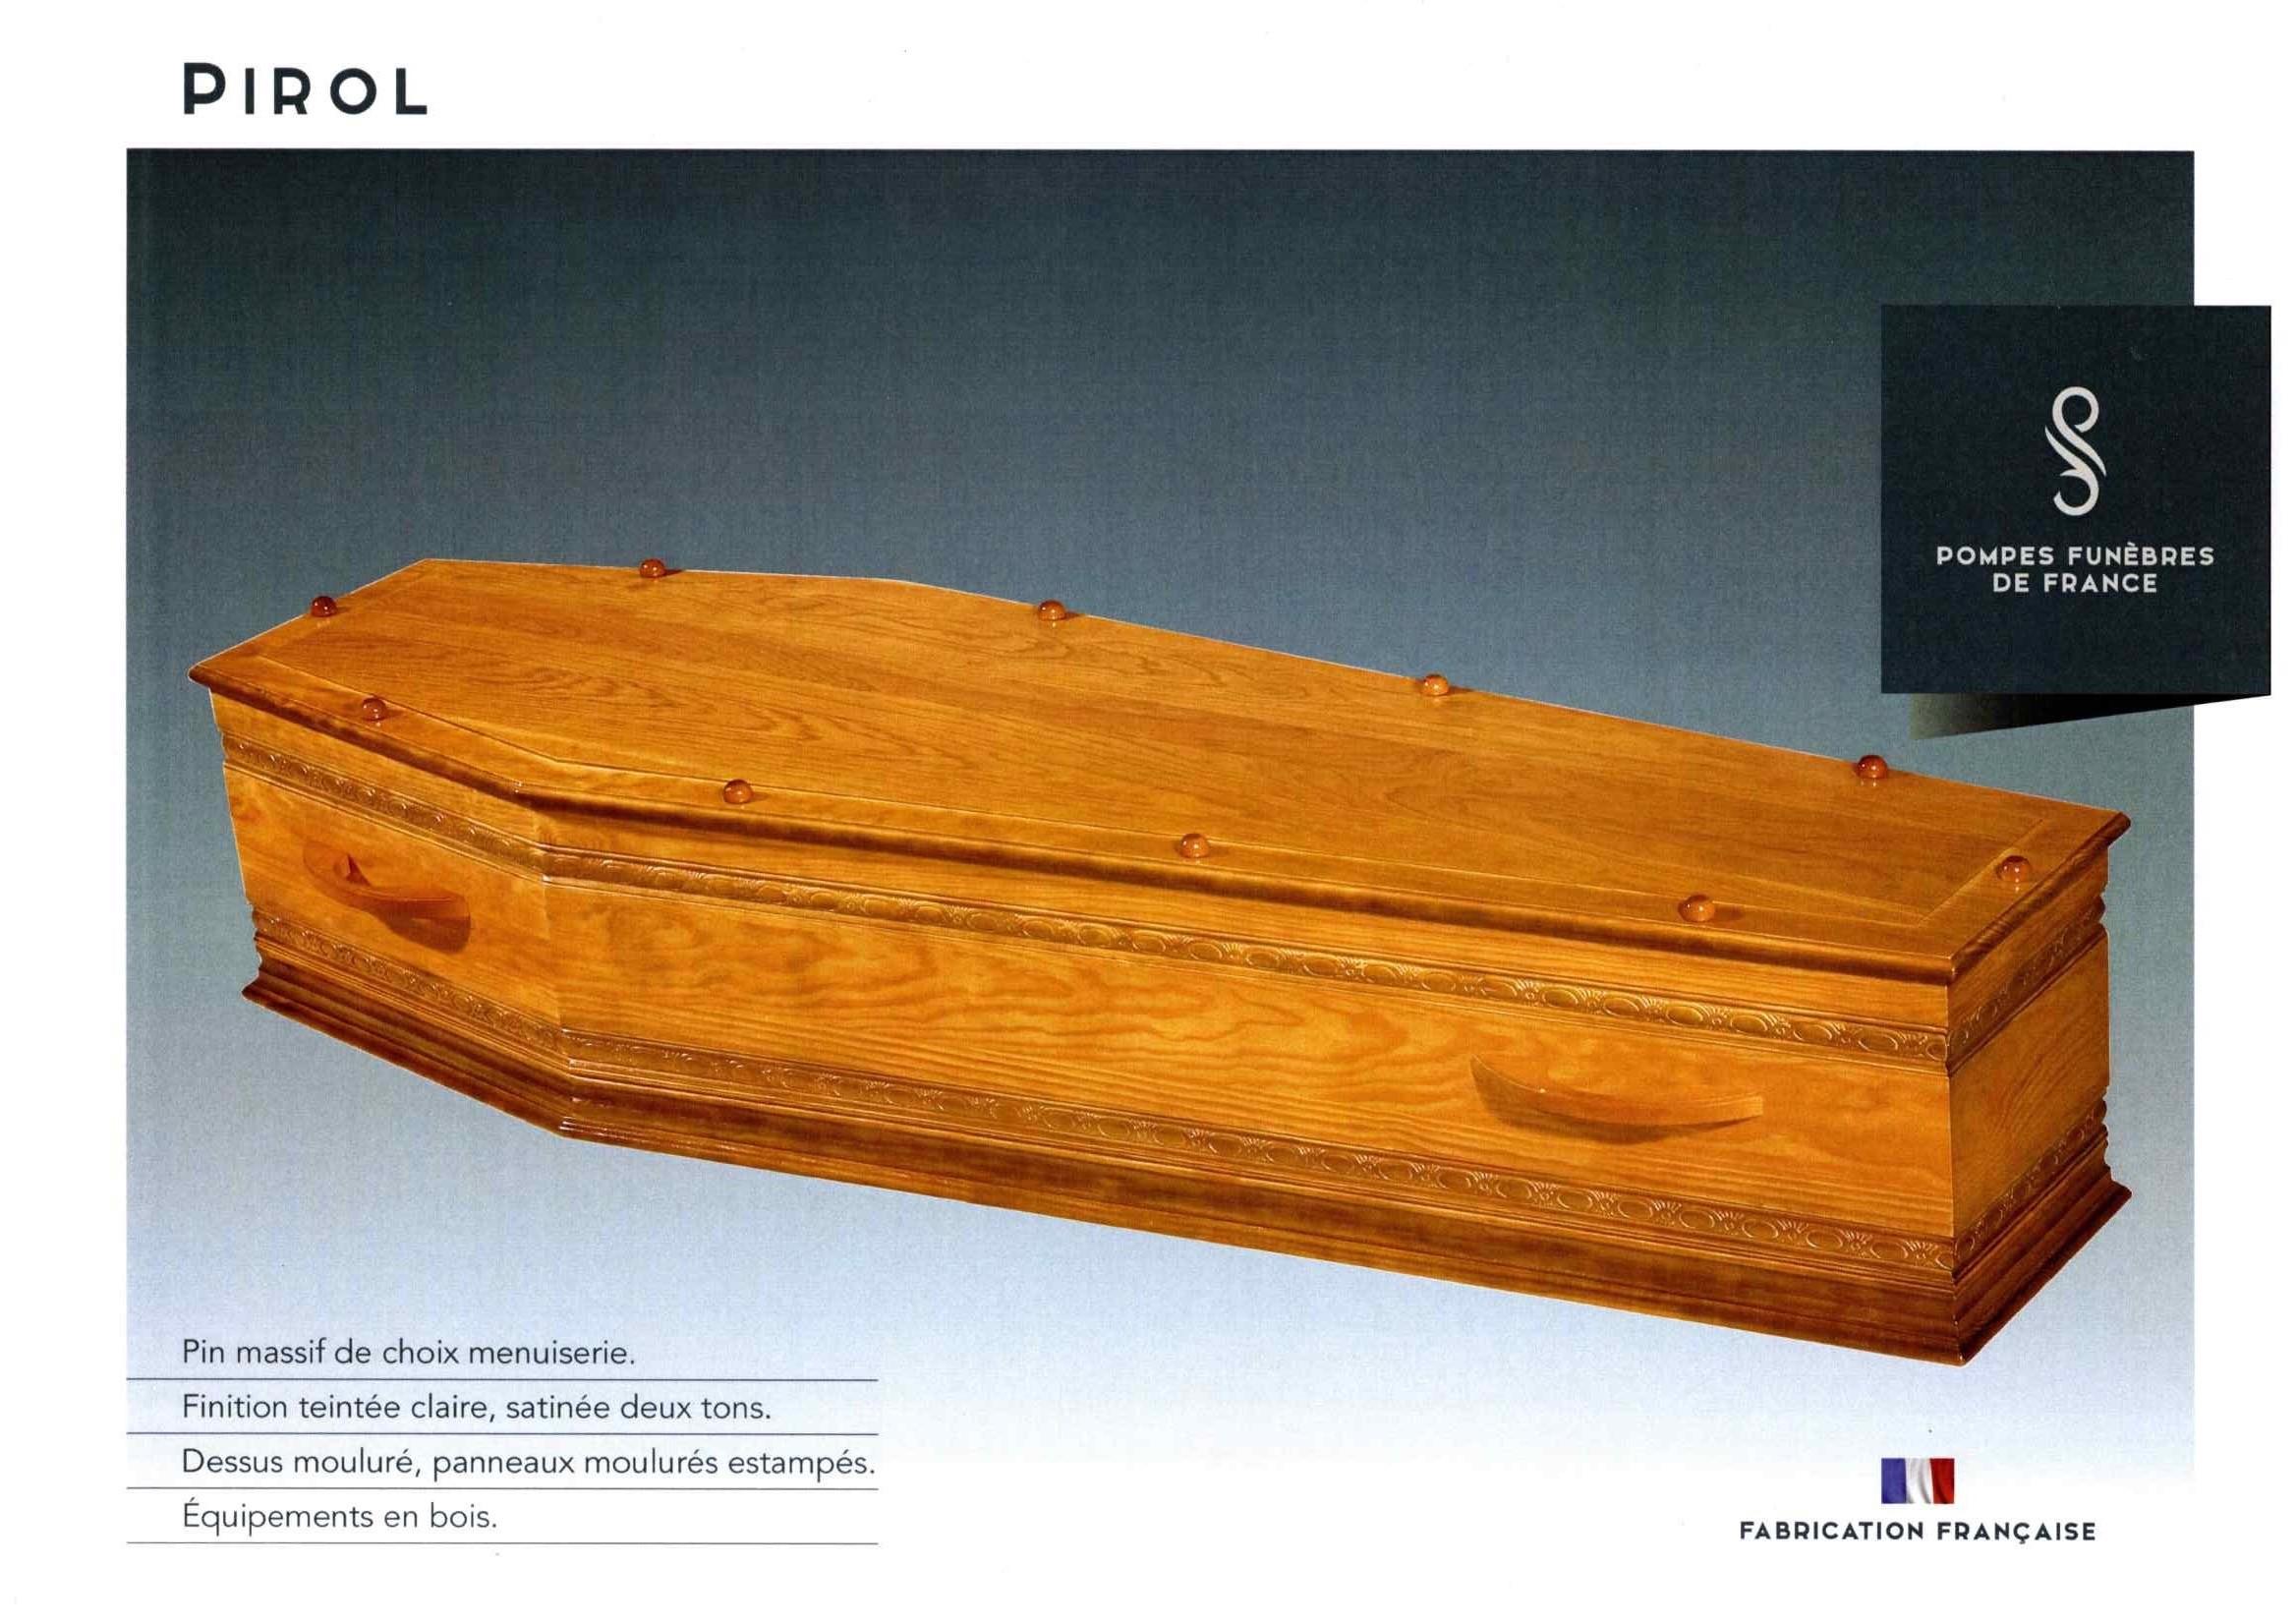 Cercueil Pirol